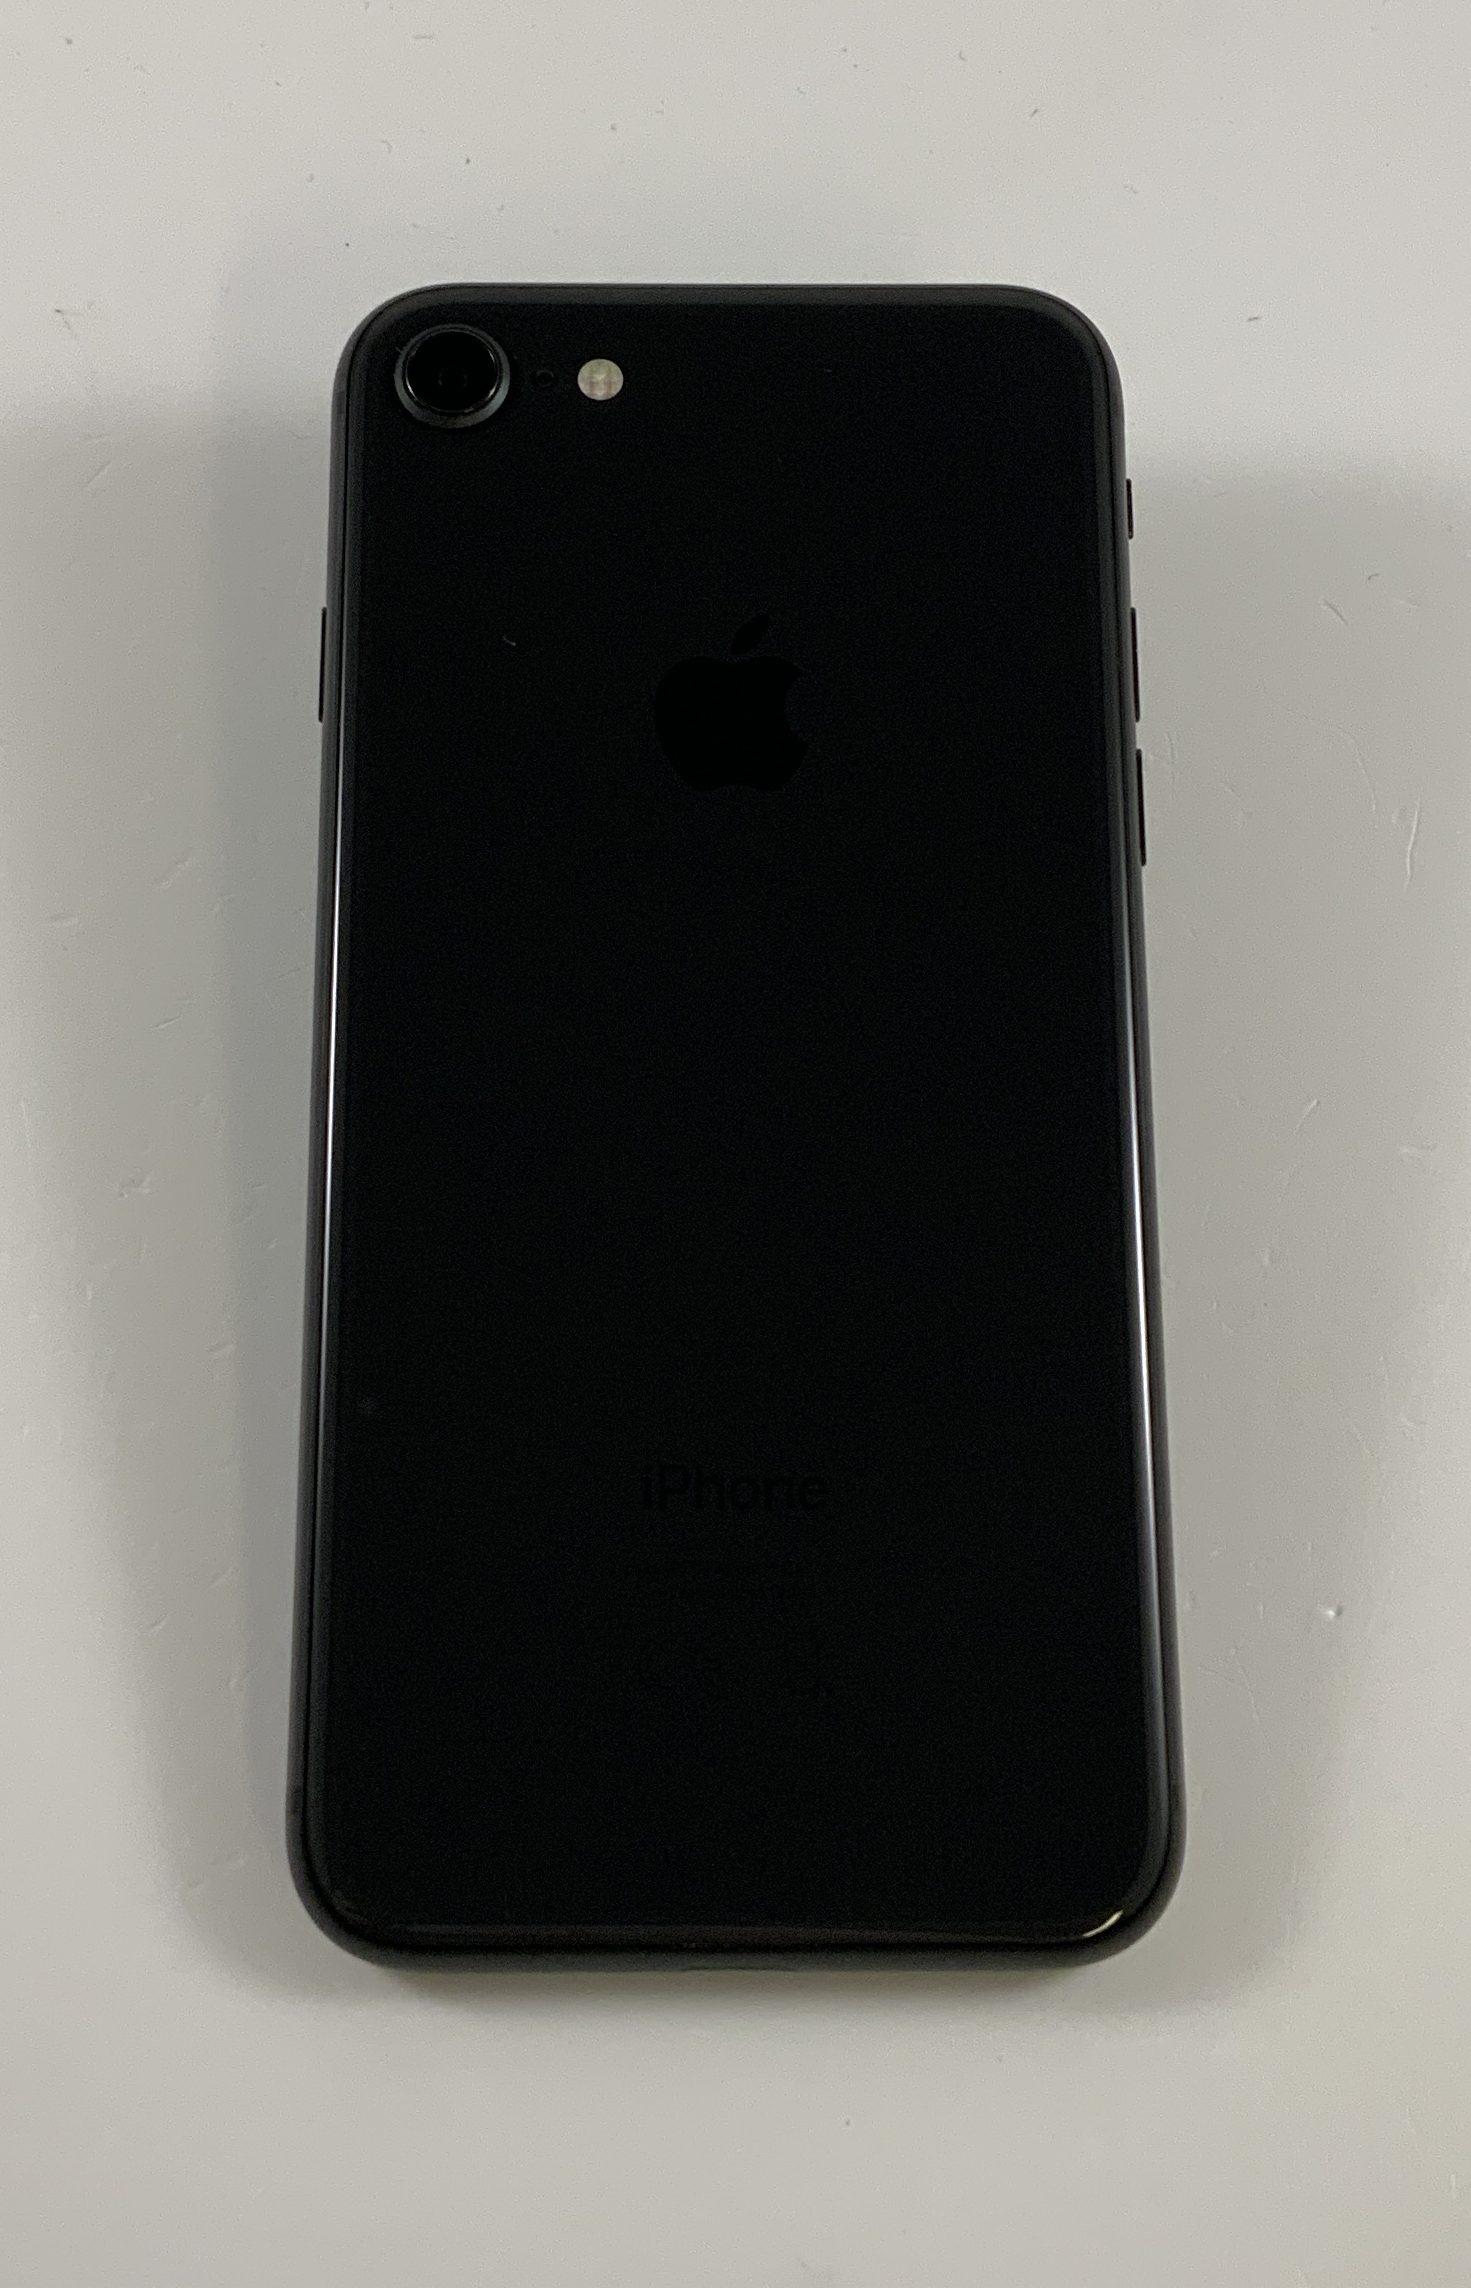 iPhone 8 64GB, 64GB, Space Gray, immagine 2